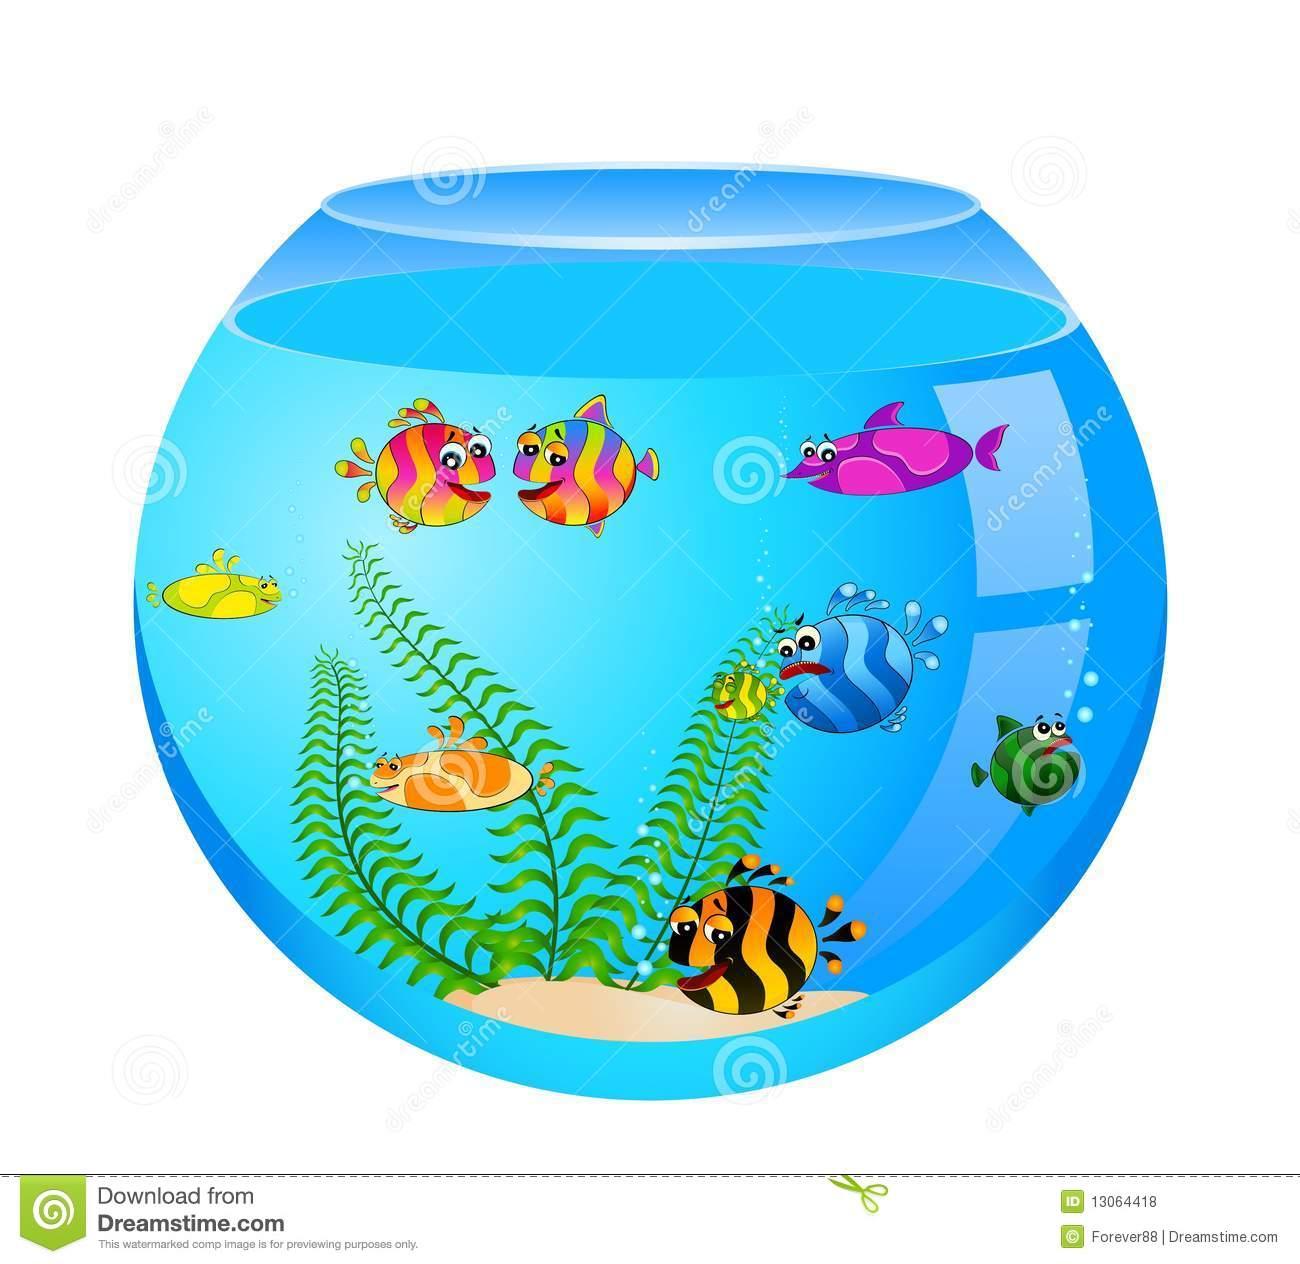 Fishtank clipart #12, Download drawings